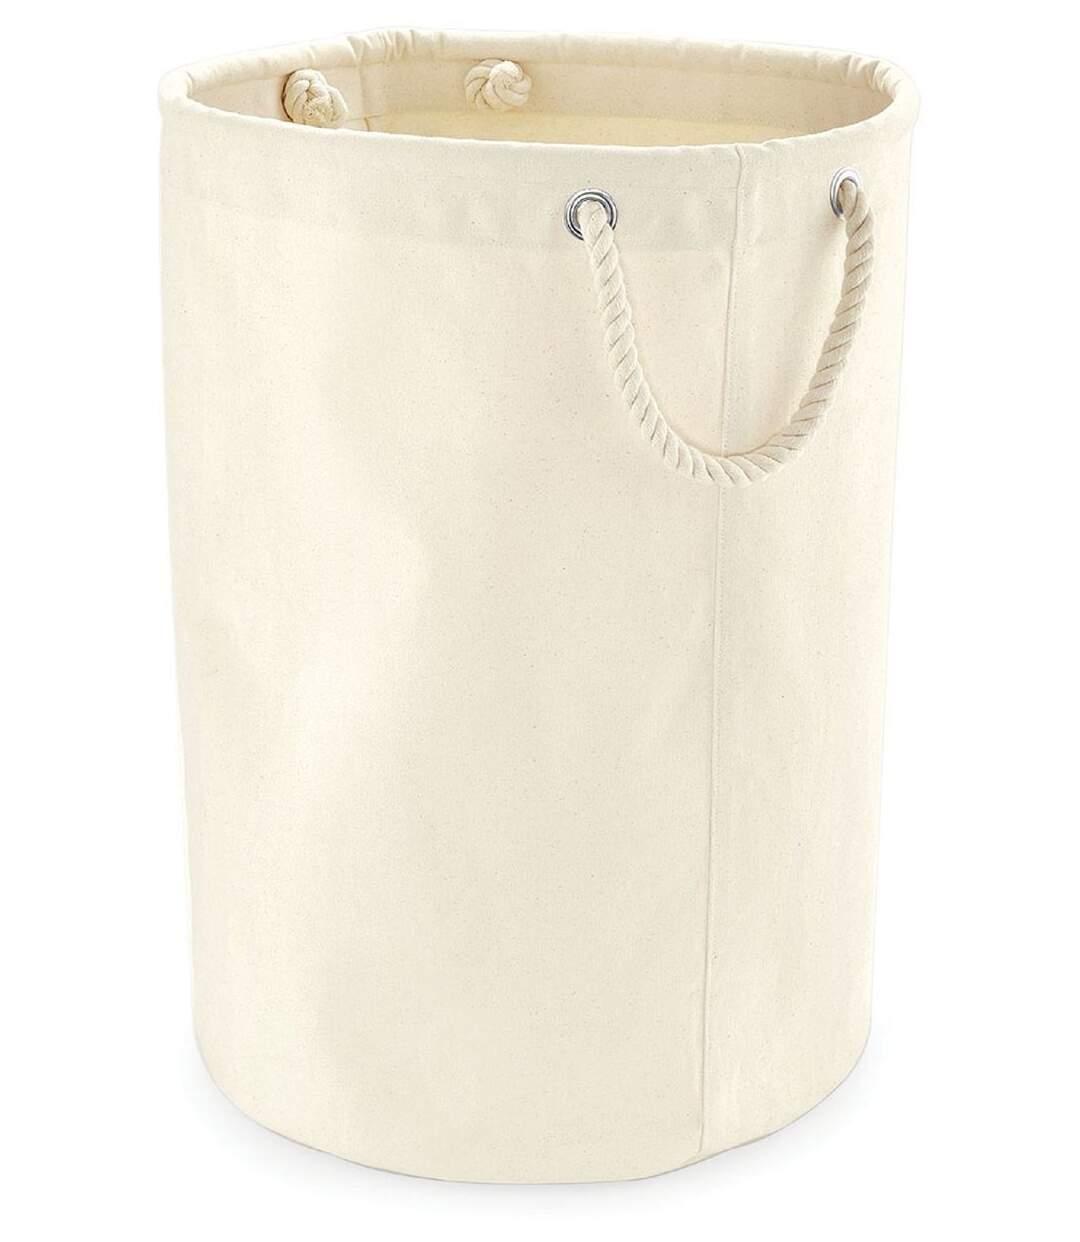 Panier de rangement taille S - W580 - beige naturel